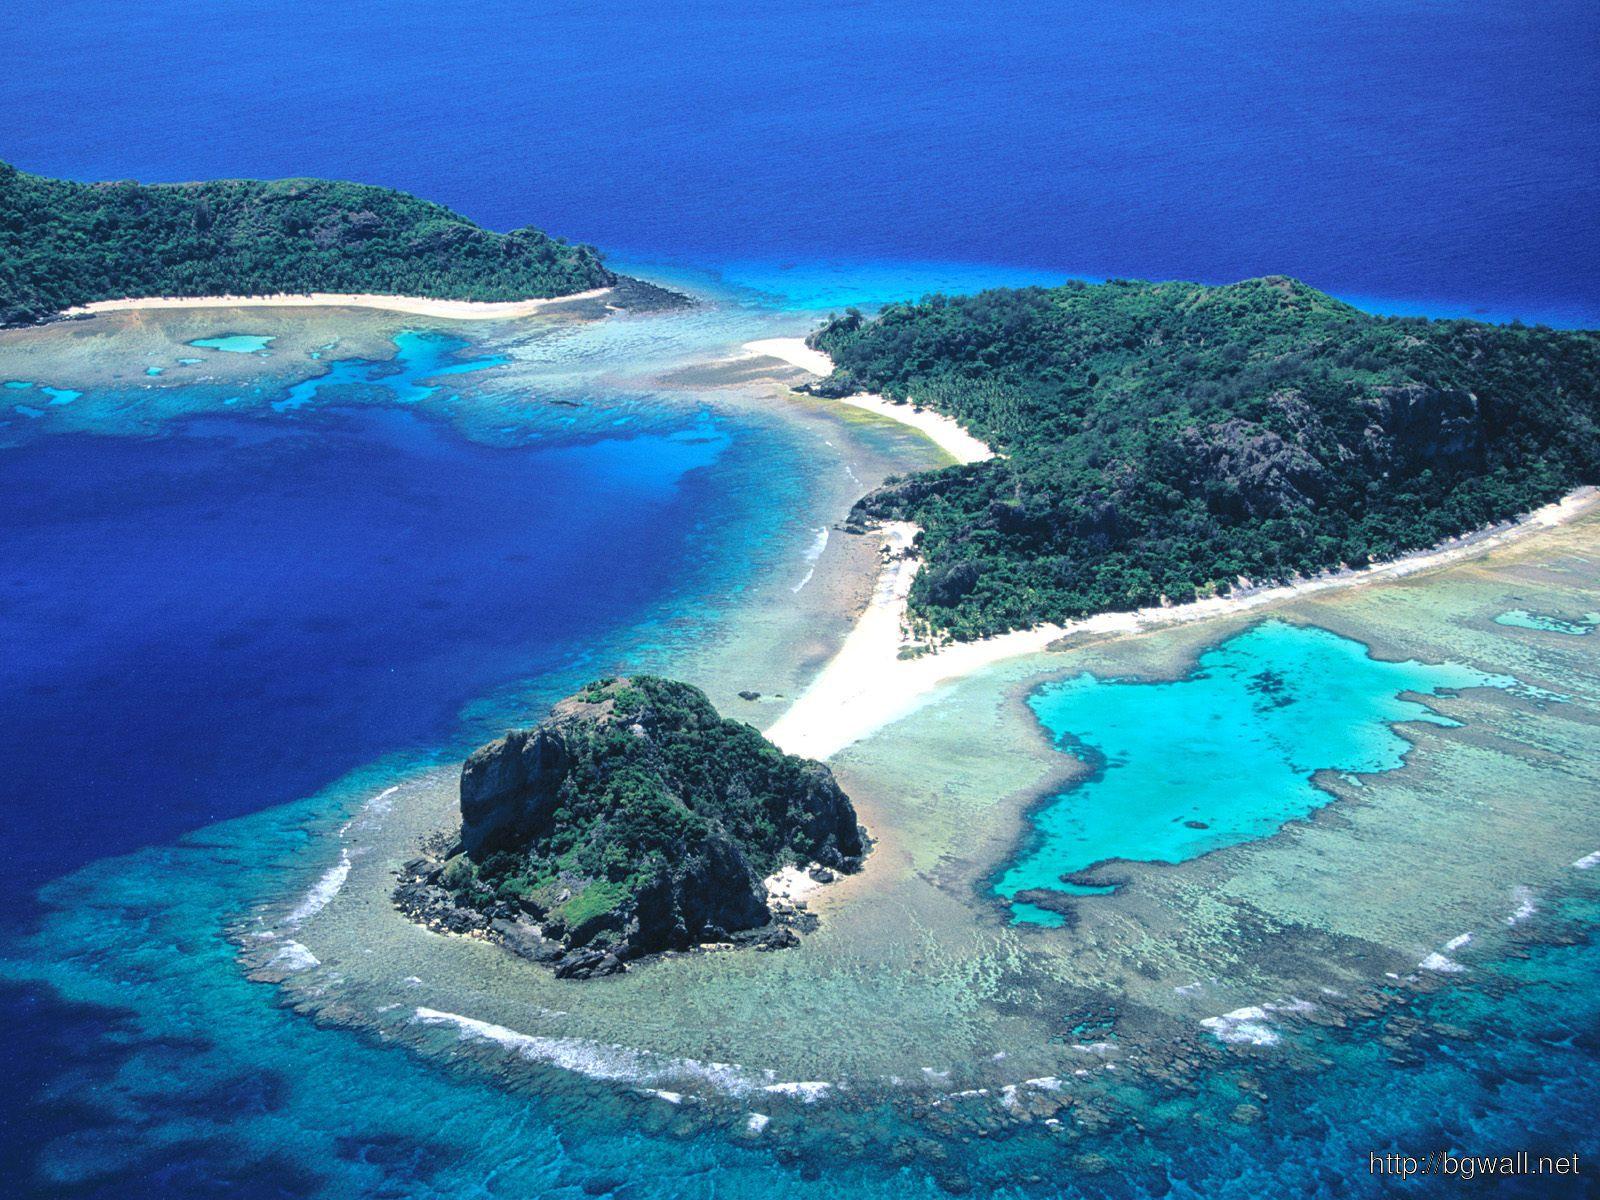 vanua-levu-and-navadra-islands-fiji-full-size.jpg